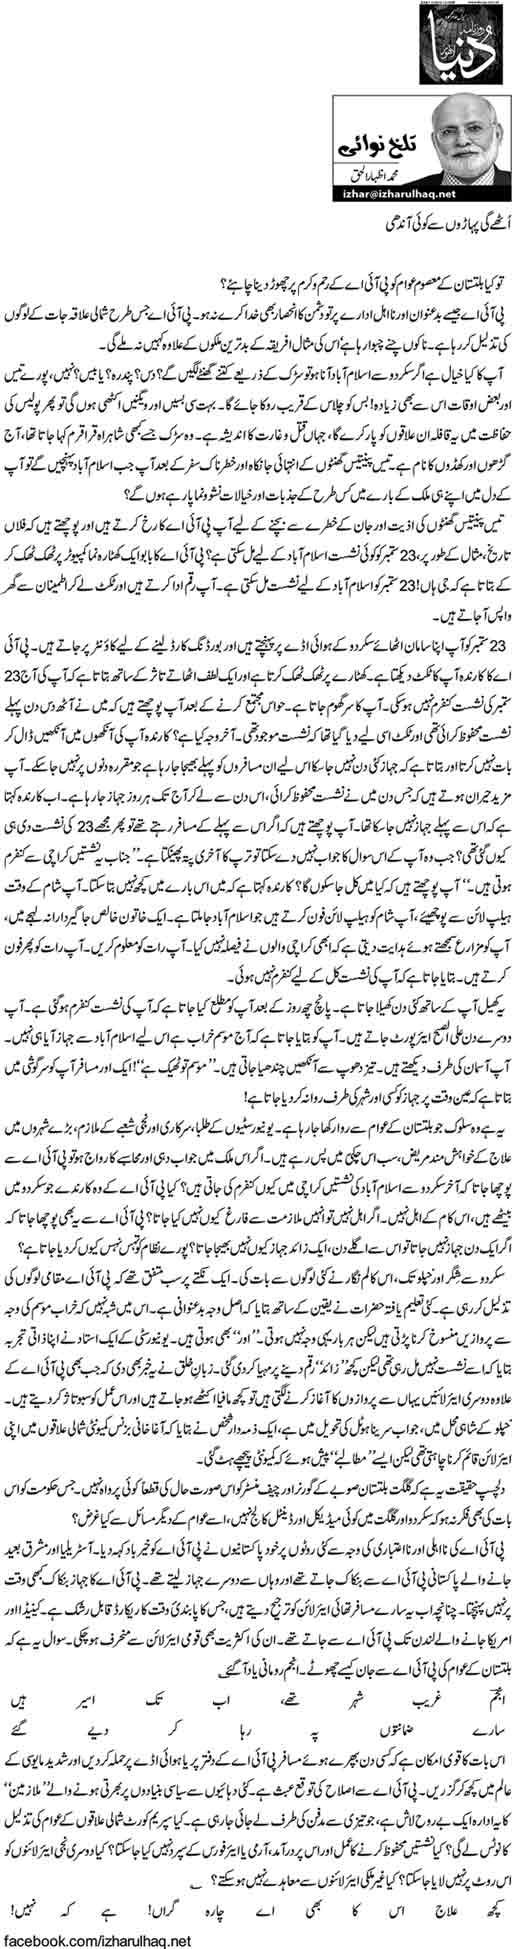 Uthay gi paharon se koi andhi - M. Izhar ul Haq